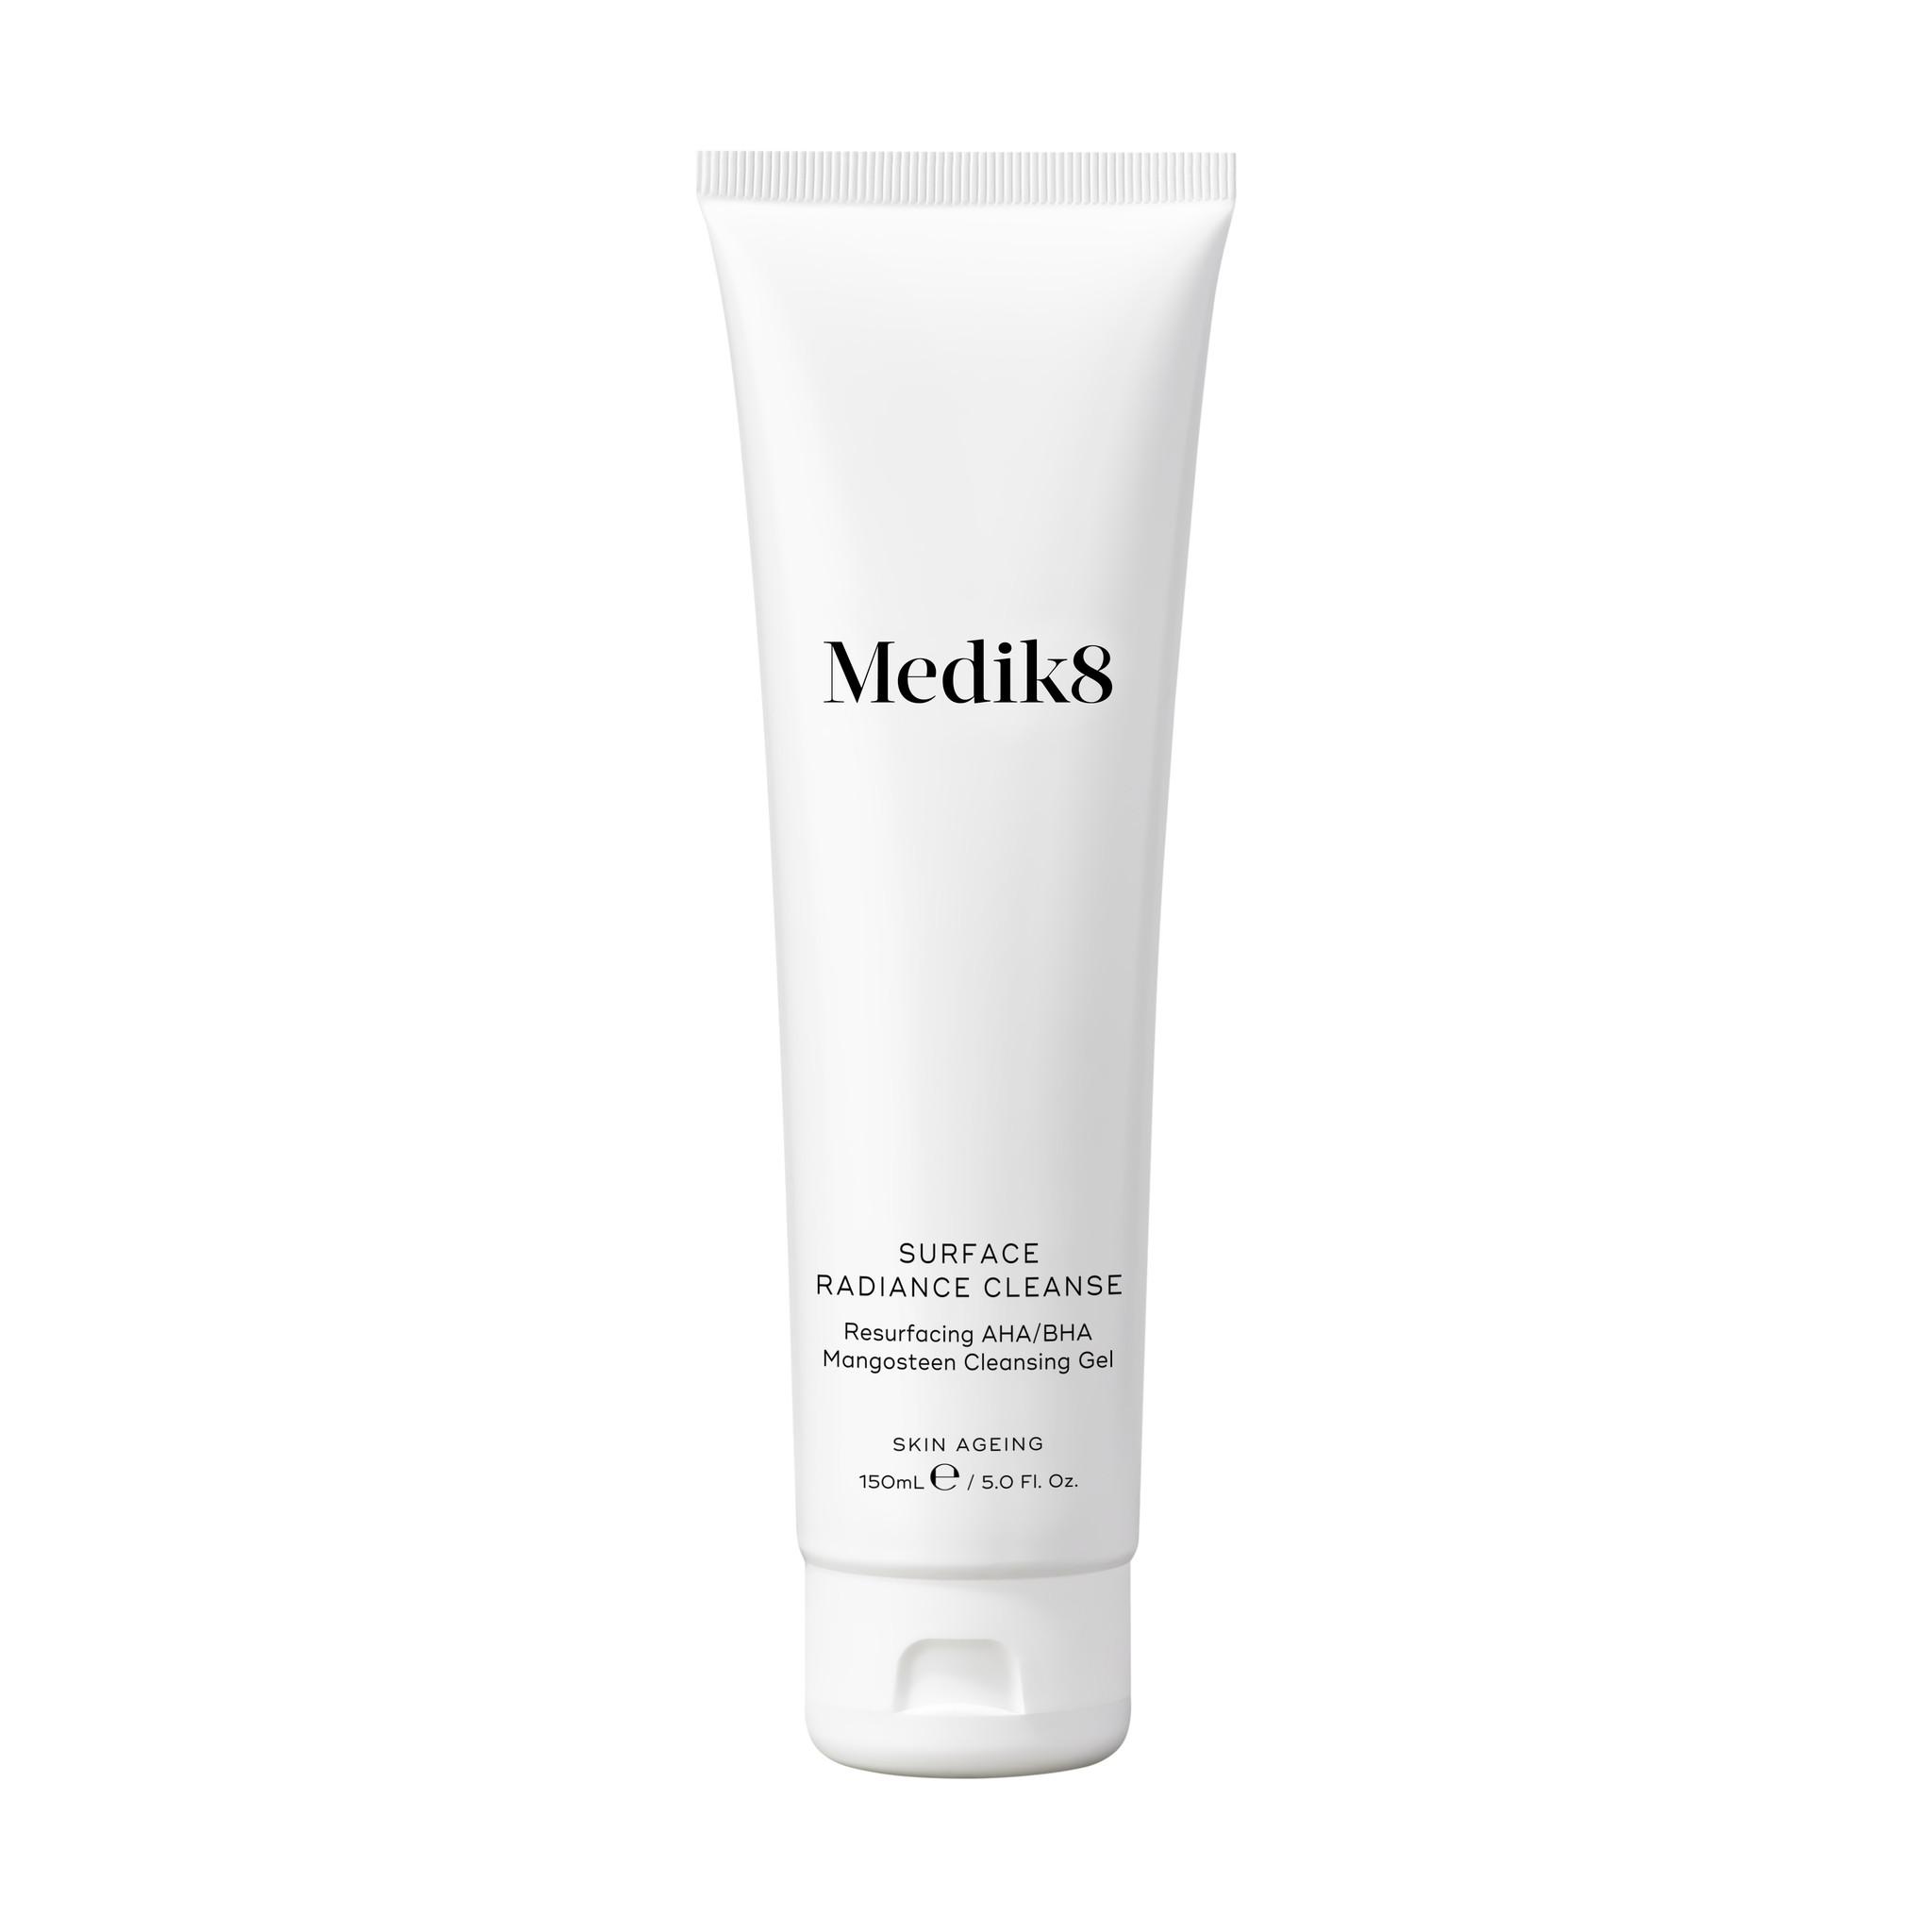 Medik8 Medik8 Gezichtsreiniger- Surface Radiance Cleanse 40ml AHA/BHA Mangosteen Cleansing Gel